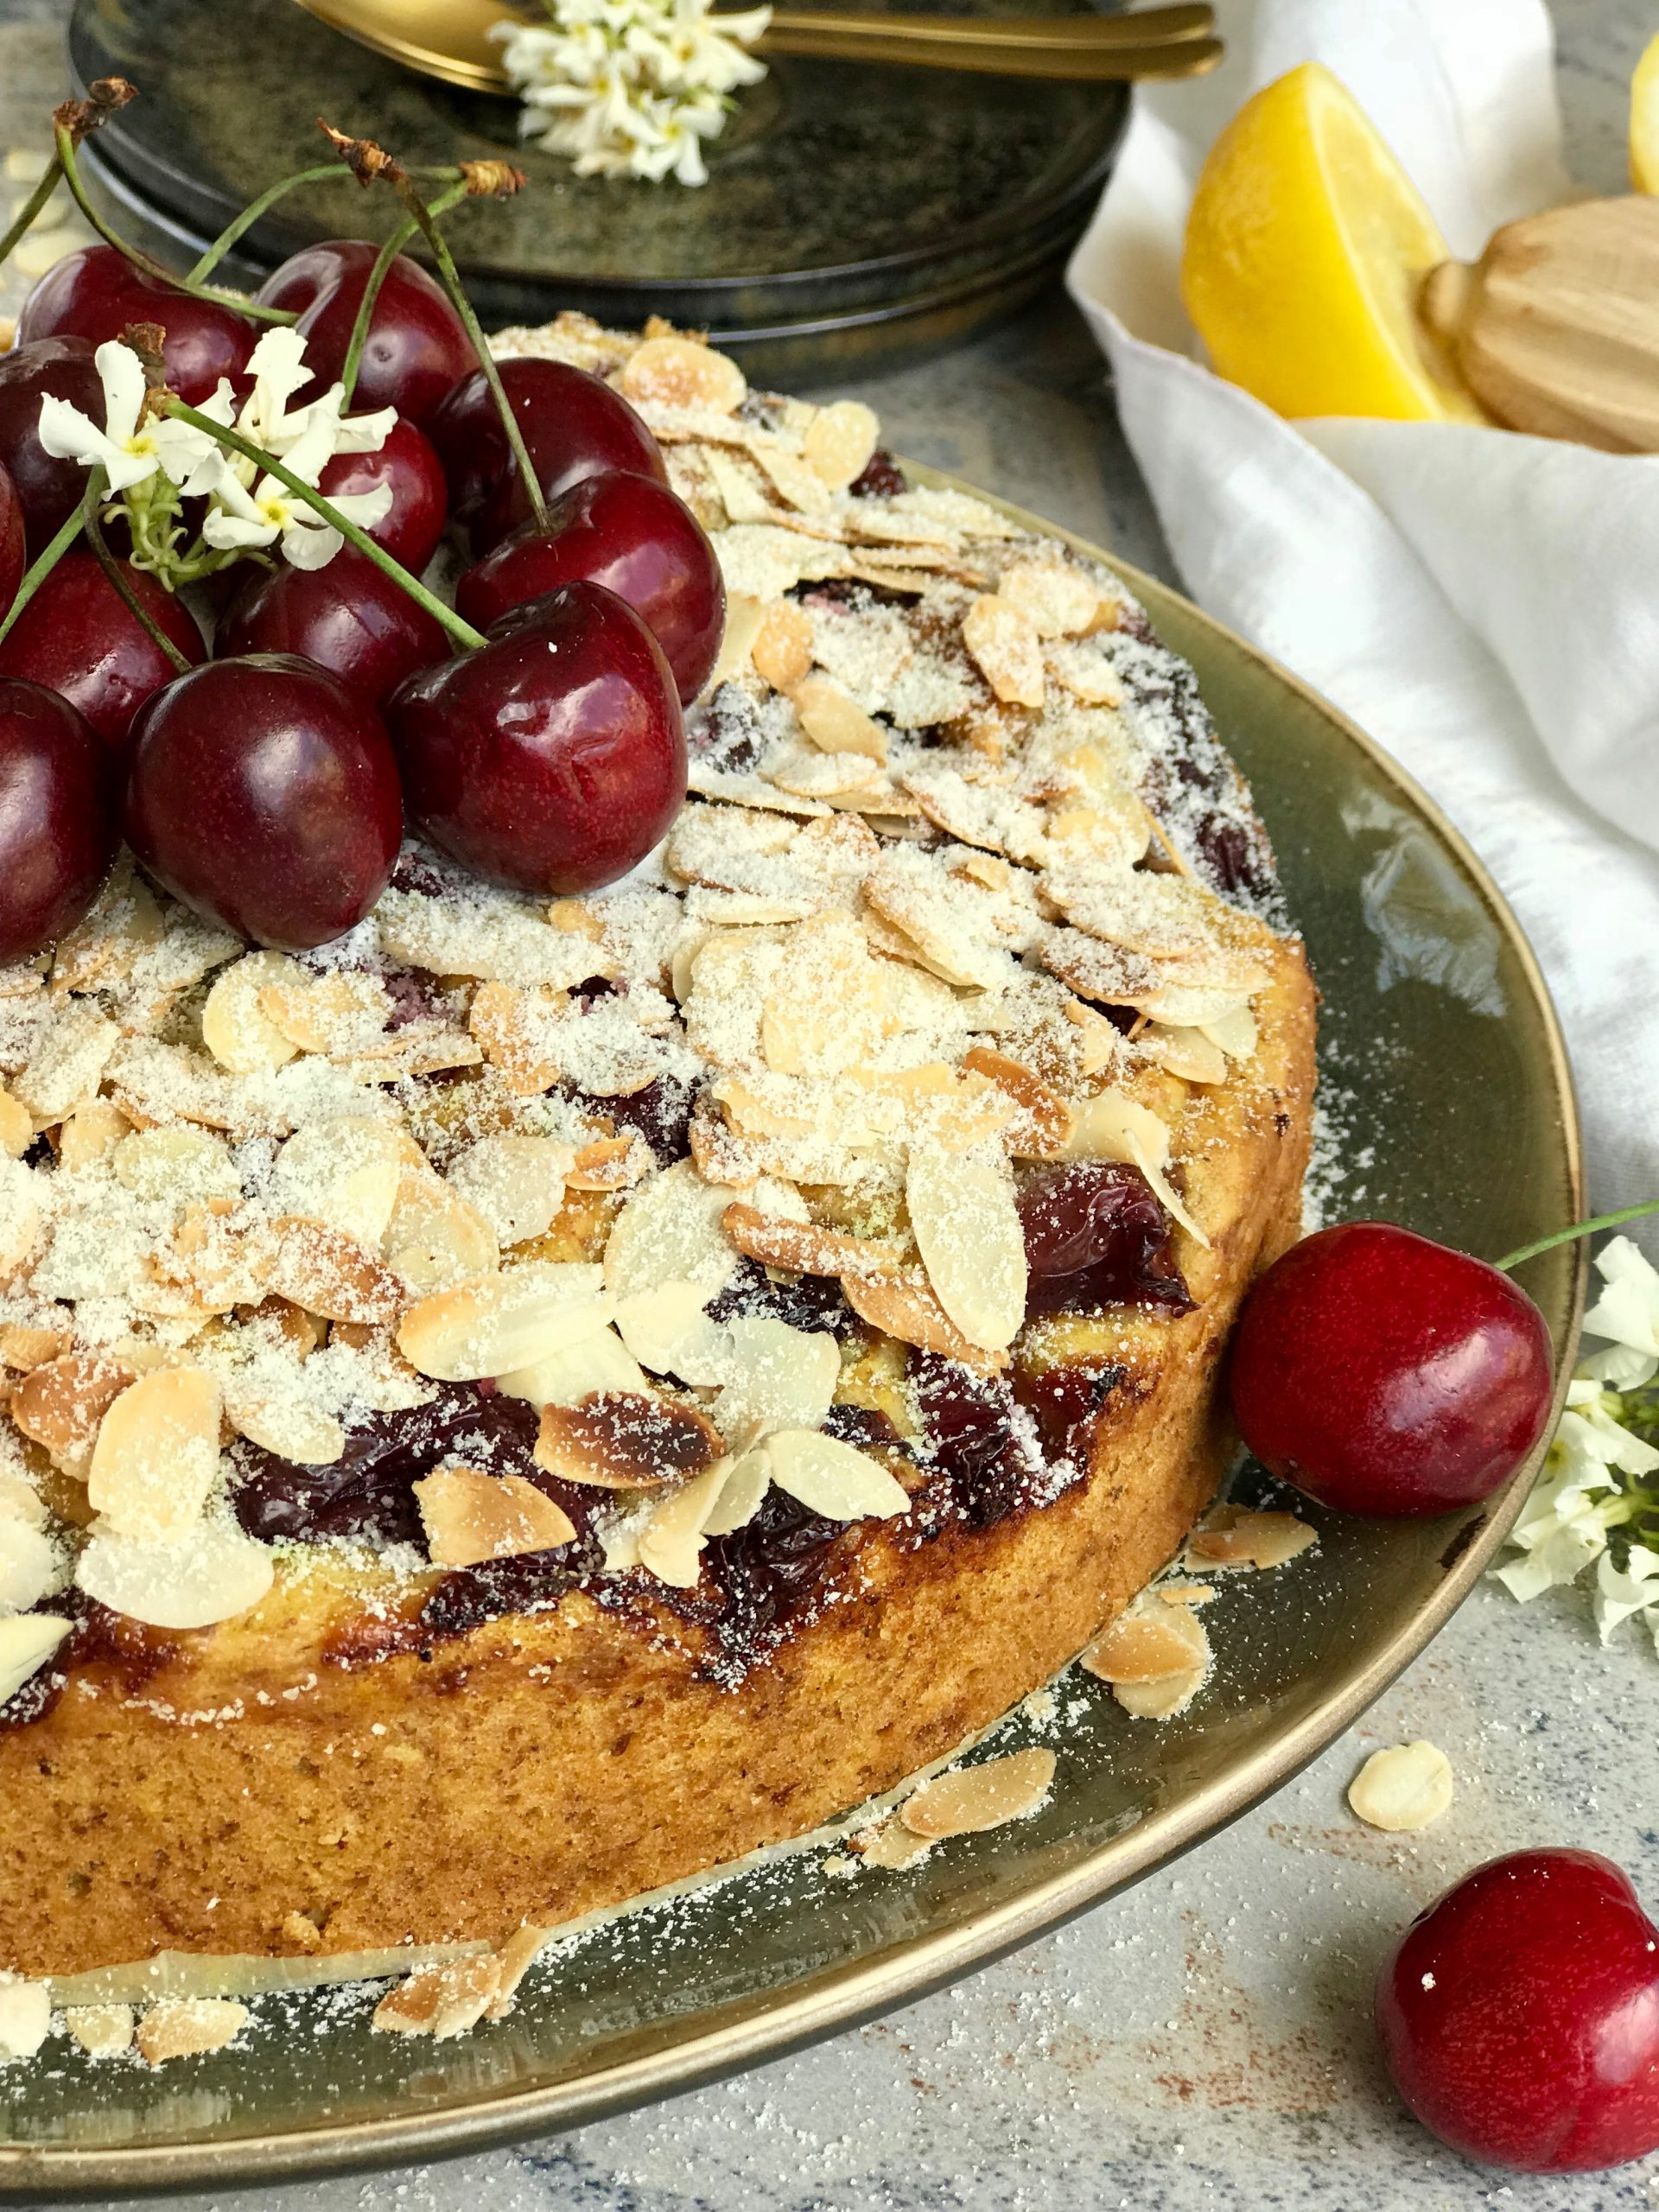 Vegan_gluten_free_cherrie_cake.jpg